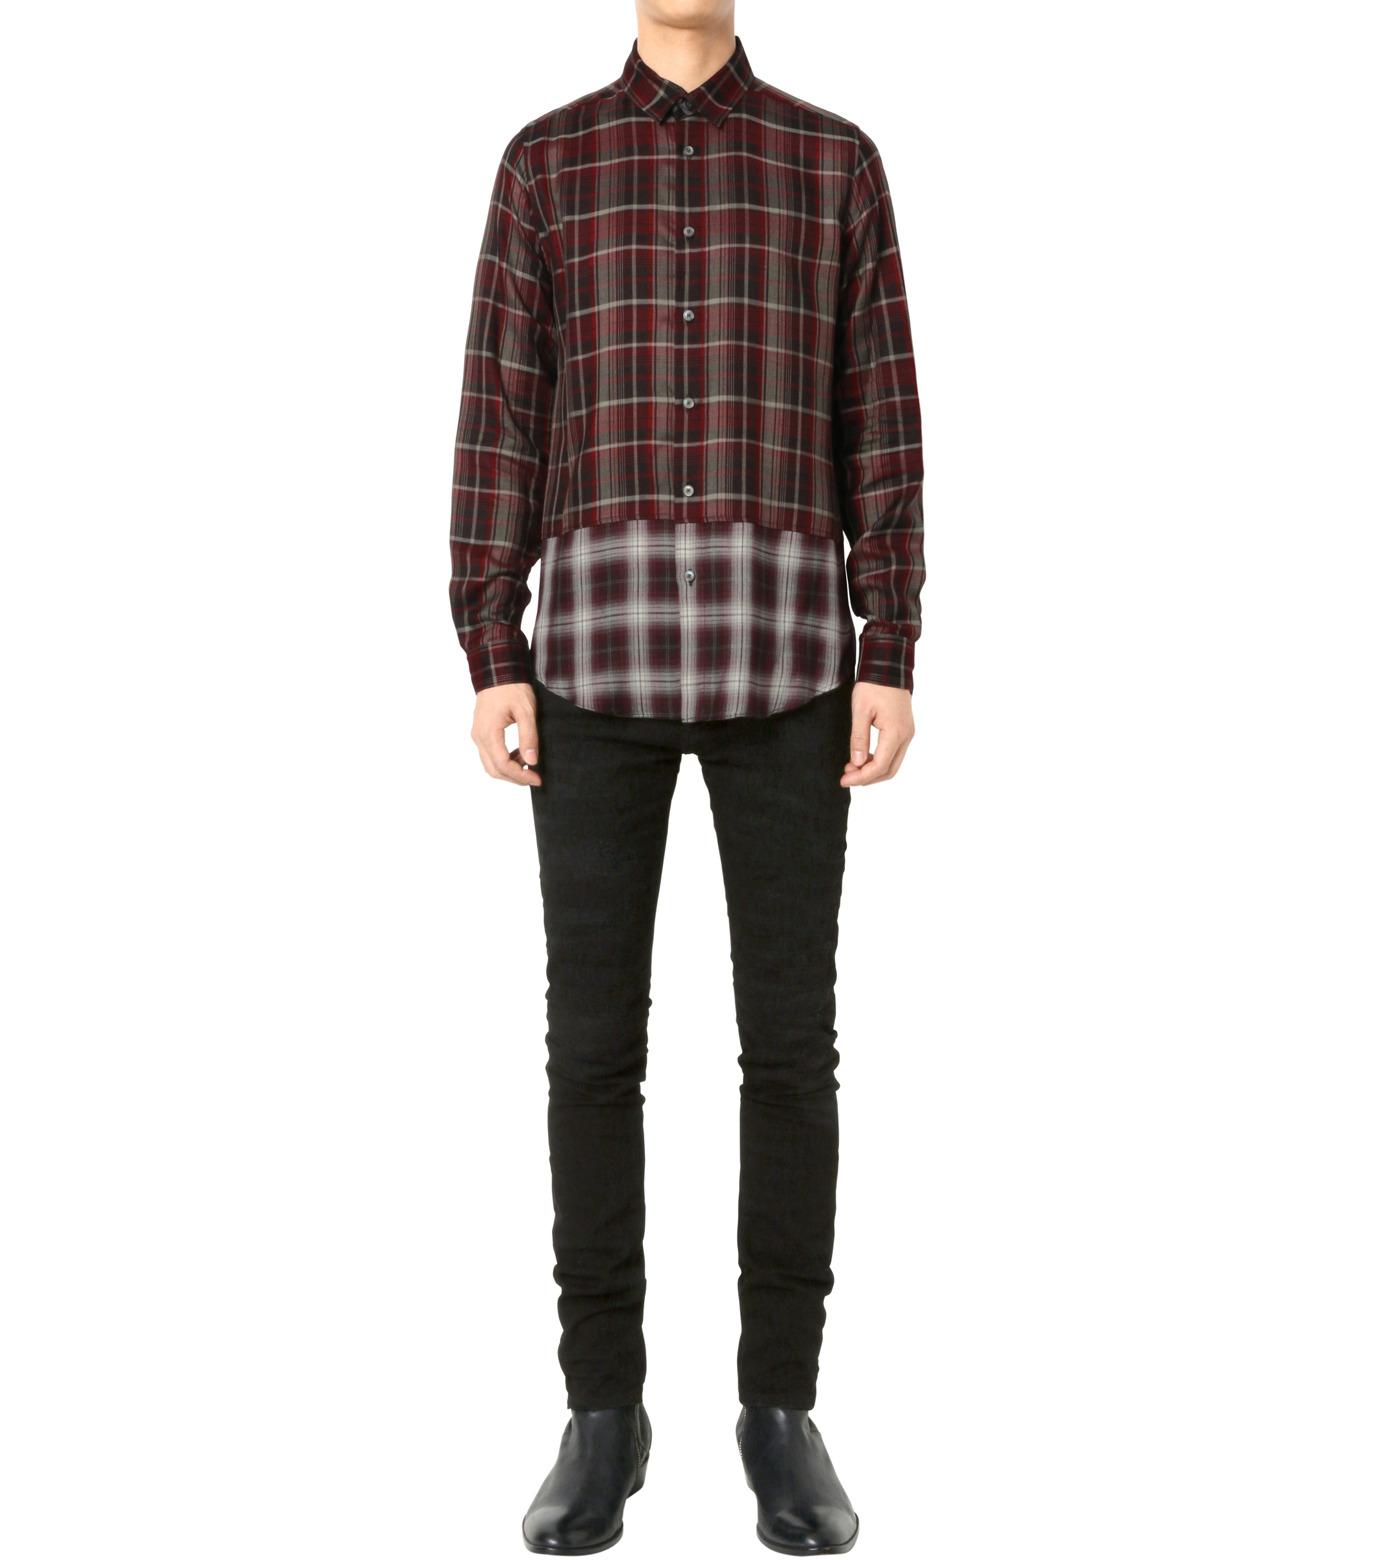 HL HEDDIE LOVU(エイチエル・エディールーヴ)のLAYERED CHECK SHIRT-RED(シャツ/shirt)-18A93001-62 拡大詳細画像3